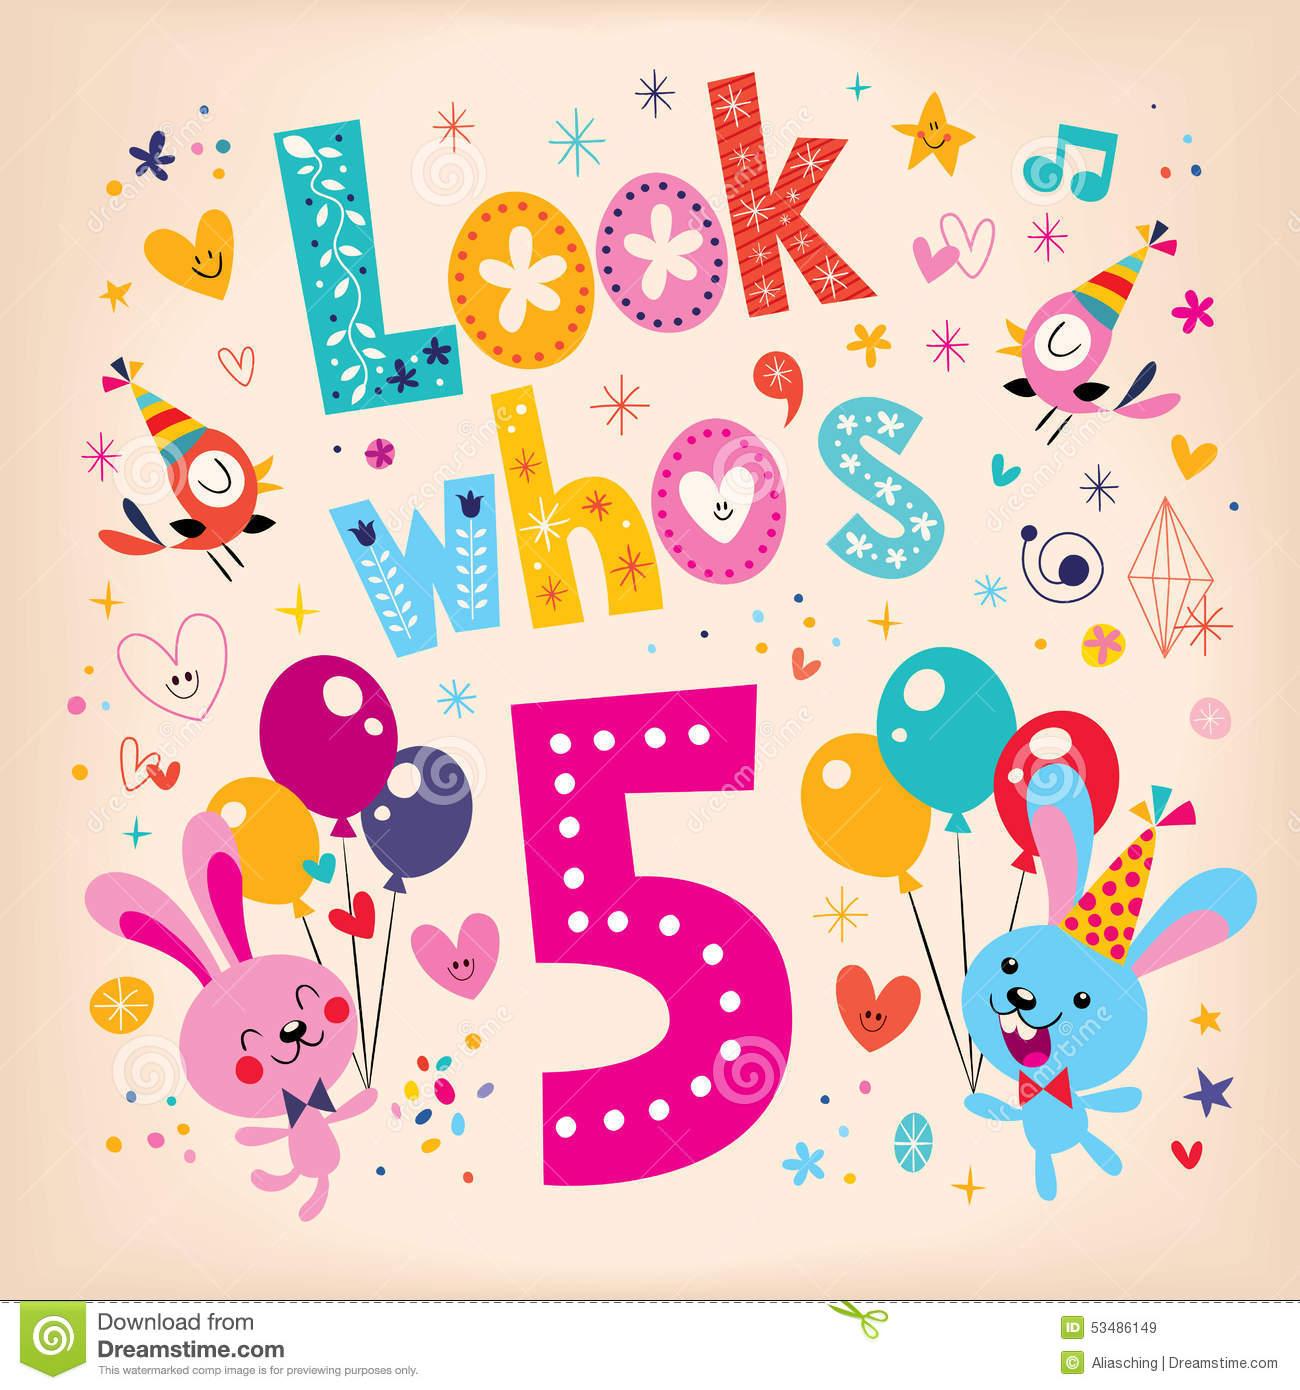 Awosme 5th Birthday Wishes 2016 Birthday Wishes Zone Happy 5th Birthday Wishes To My